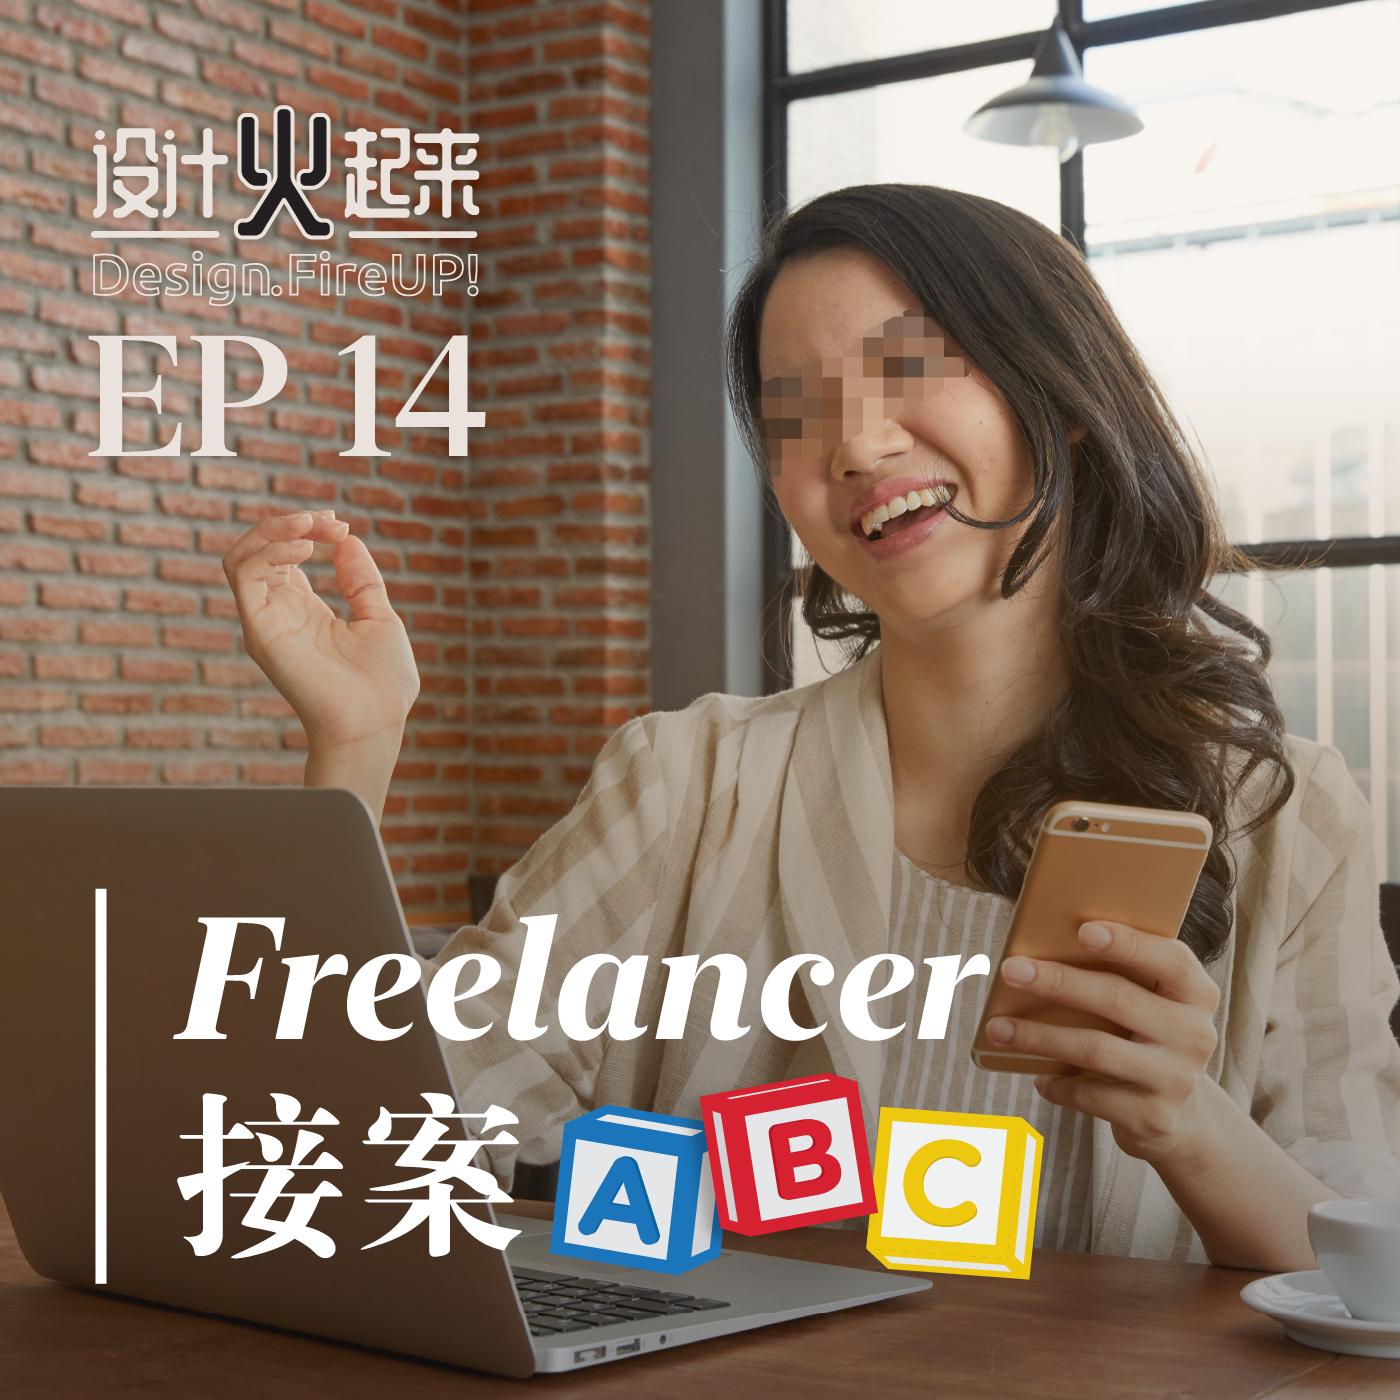 EP14 Freelancer接案ABC